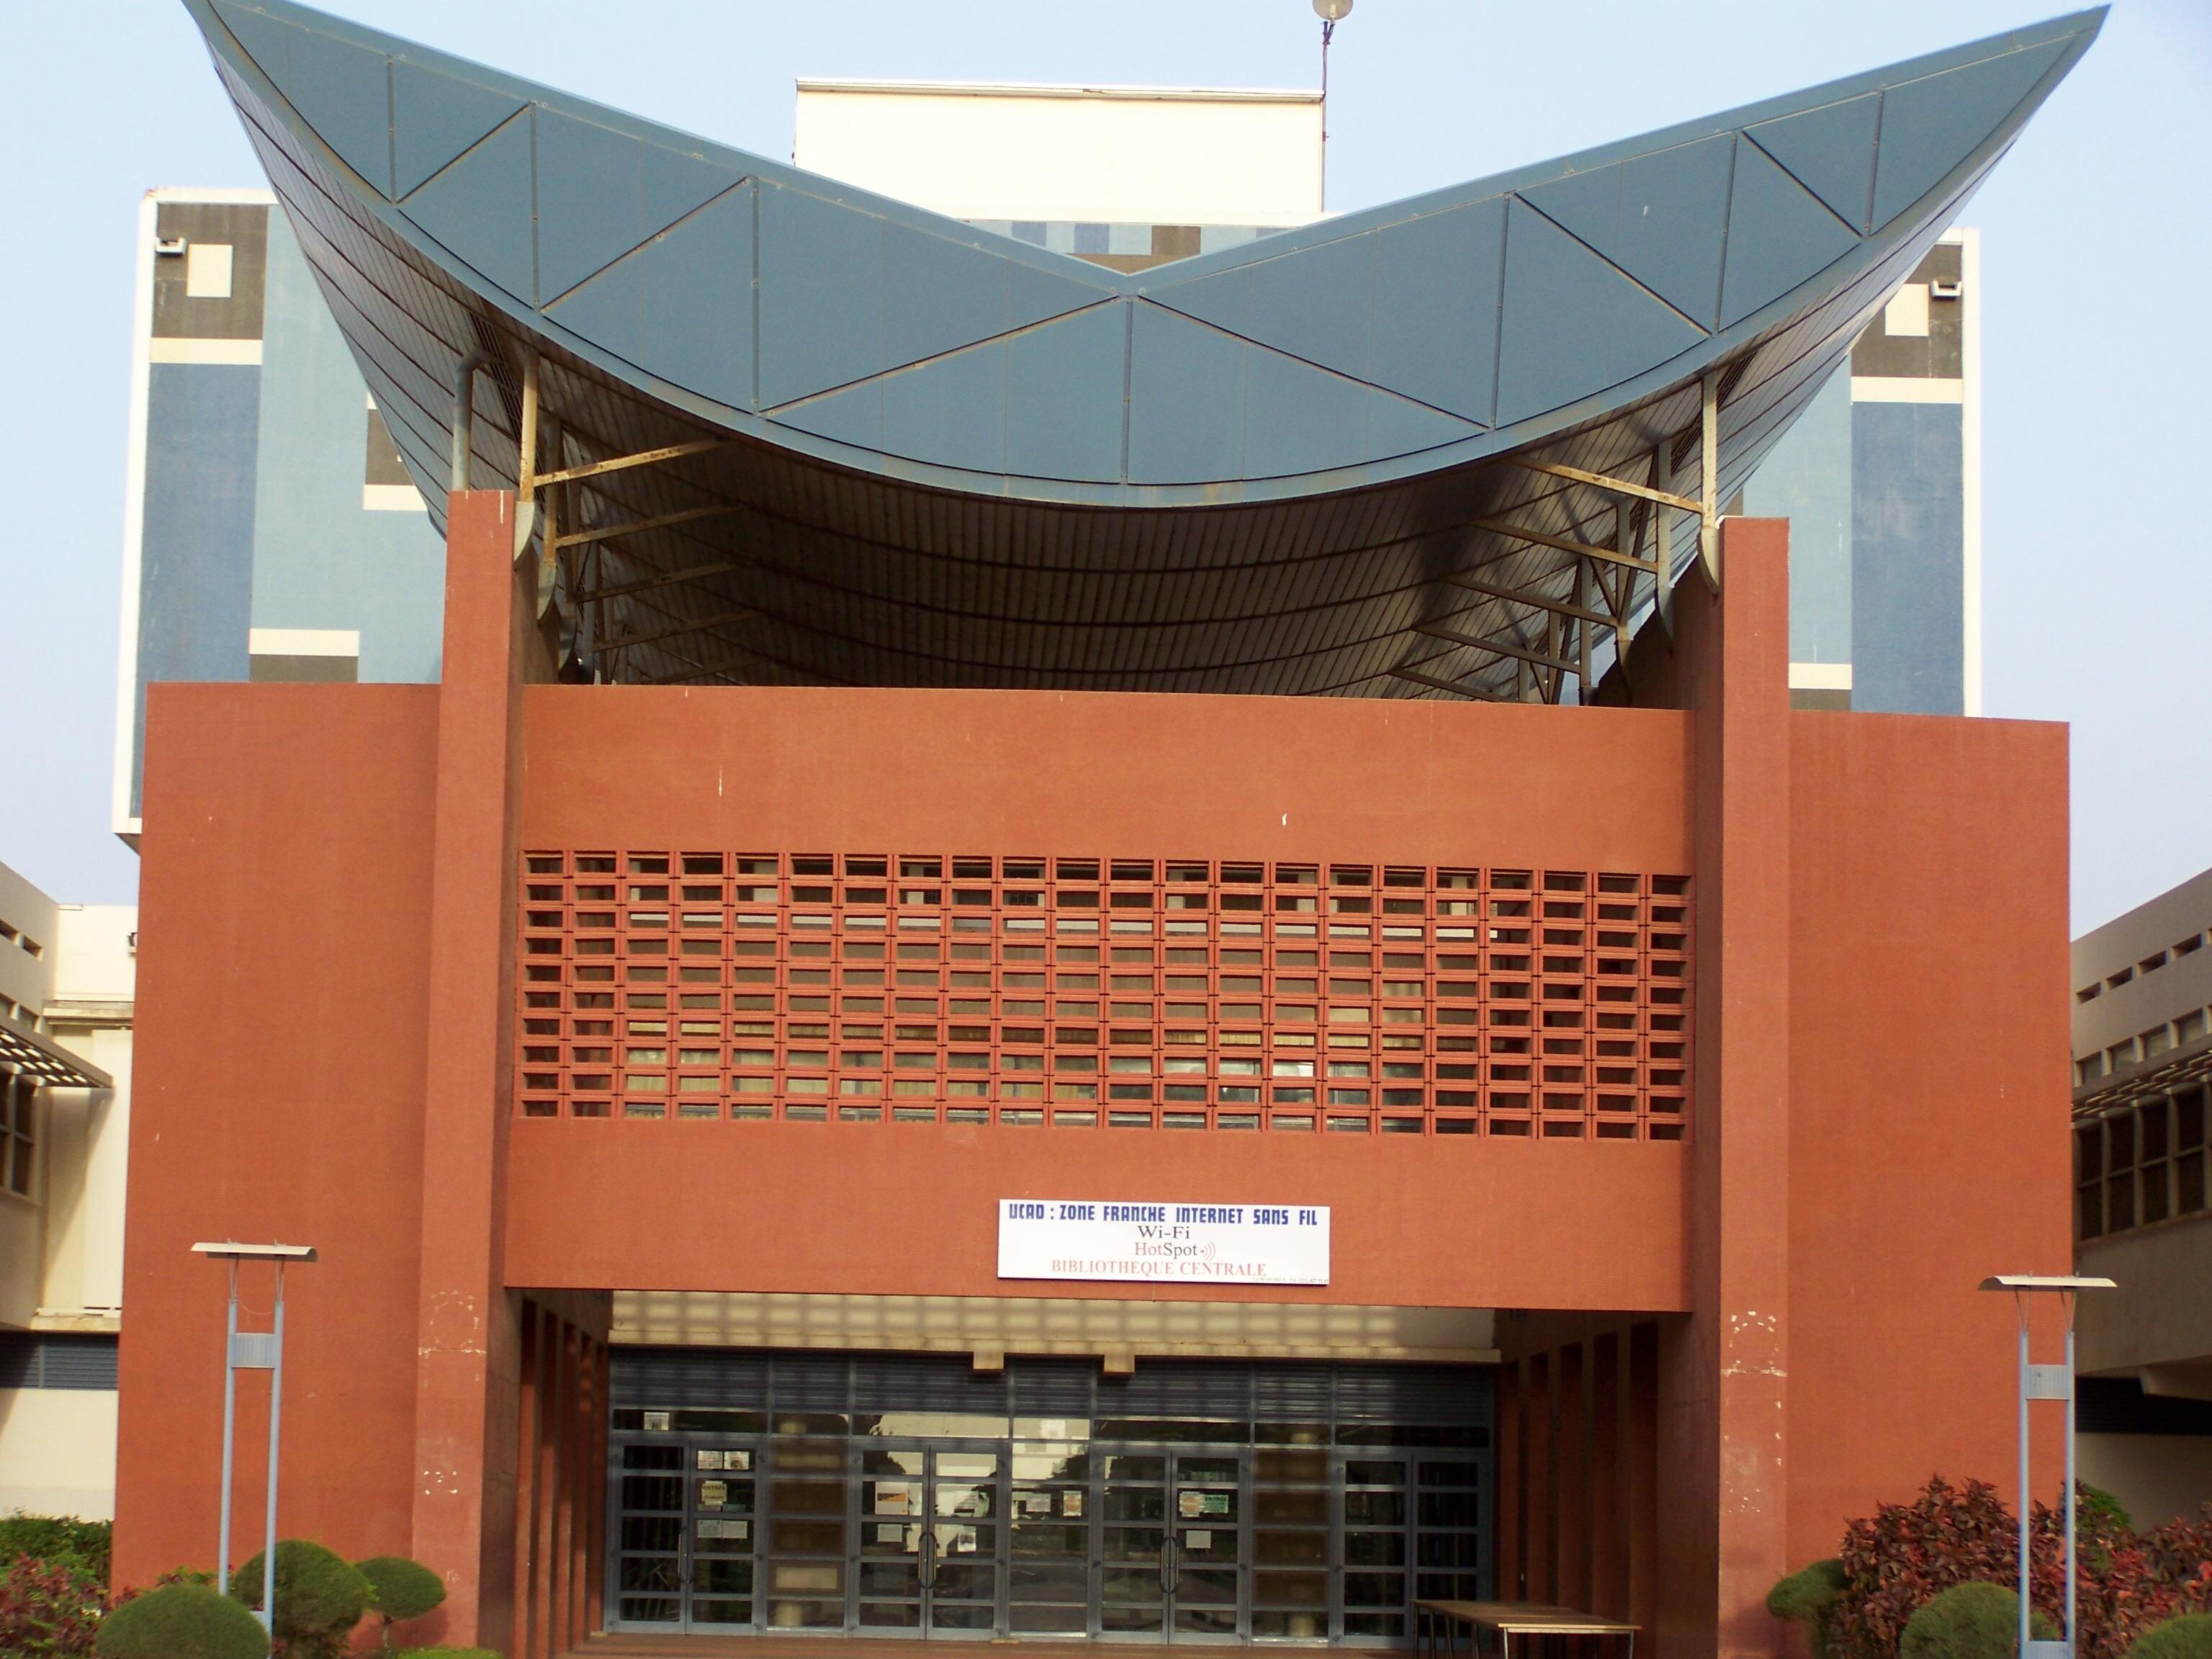 Bibliothéque_université_cheikh_anta_diop_de_dakar_2.JPG (3072×2304)